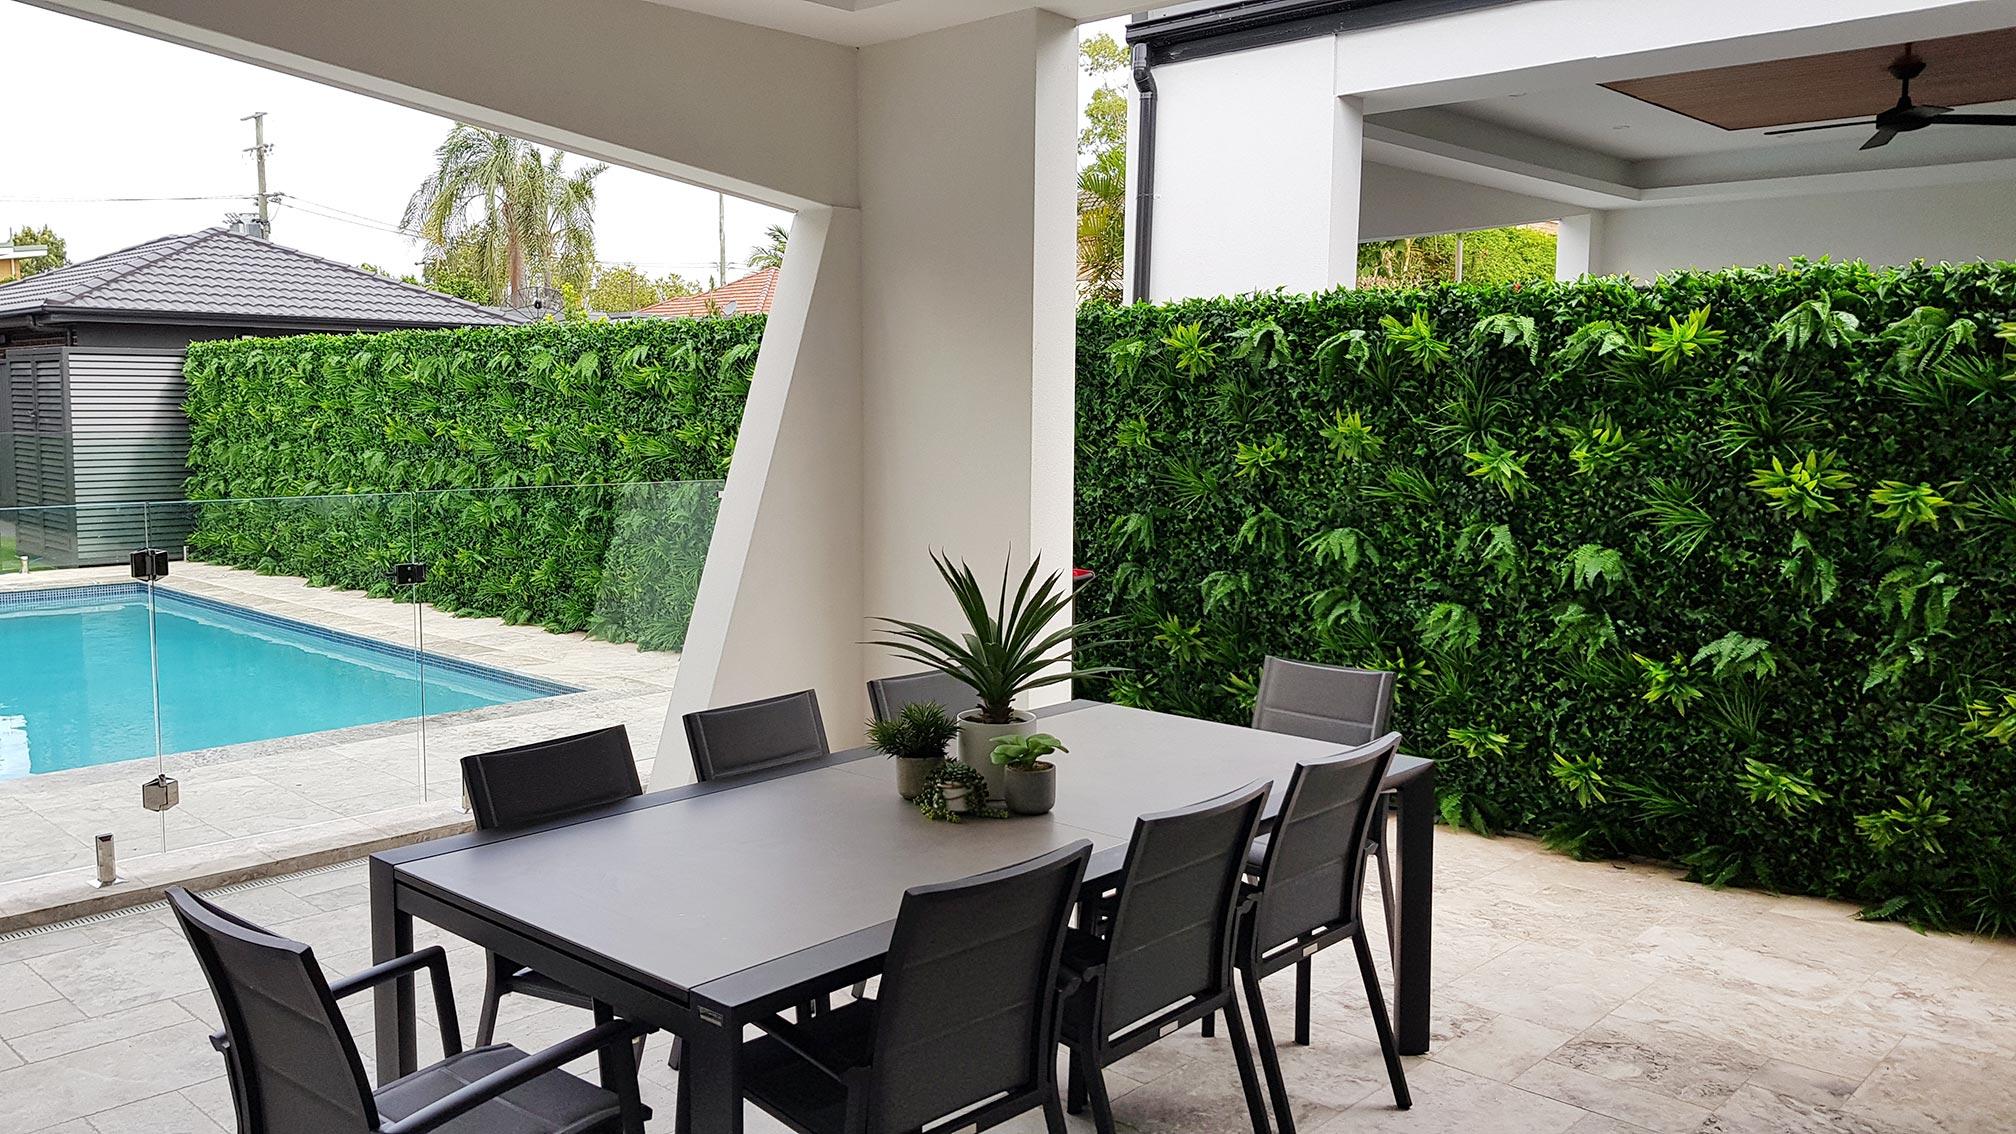 Evergreen Coastal Green Wall Installation